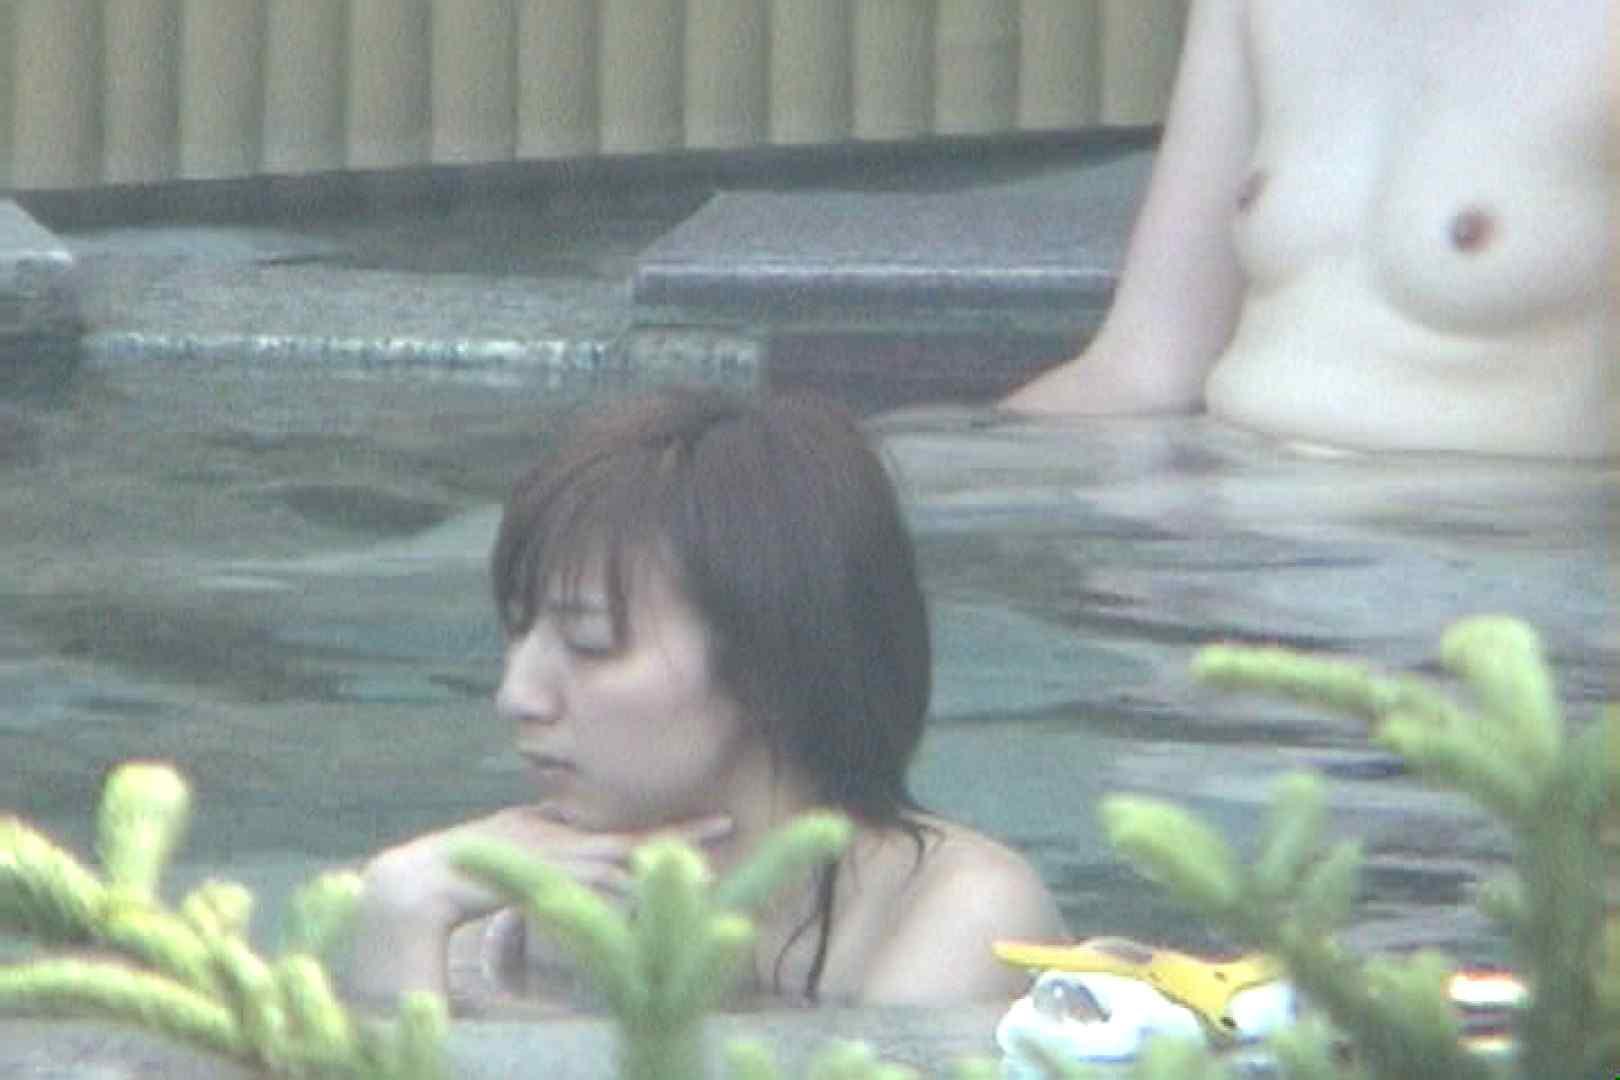 Aquaな露天風呂Vol.77【VIP限定】 露天   盗撮特集  98画像 17